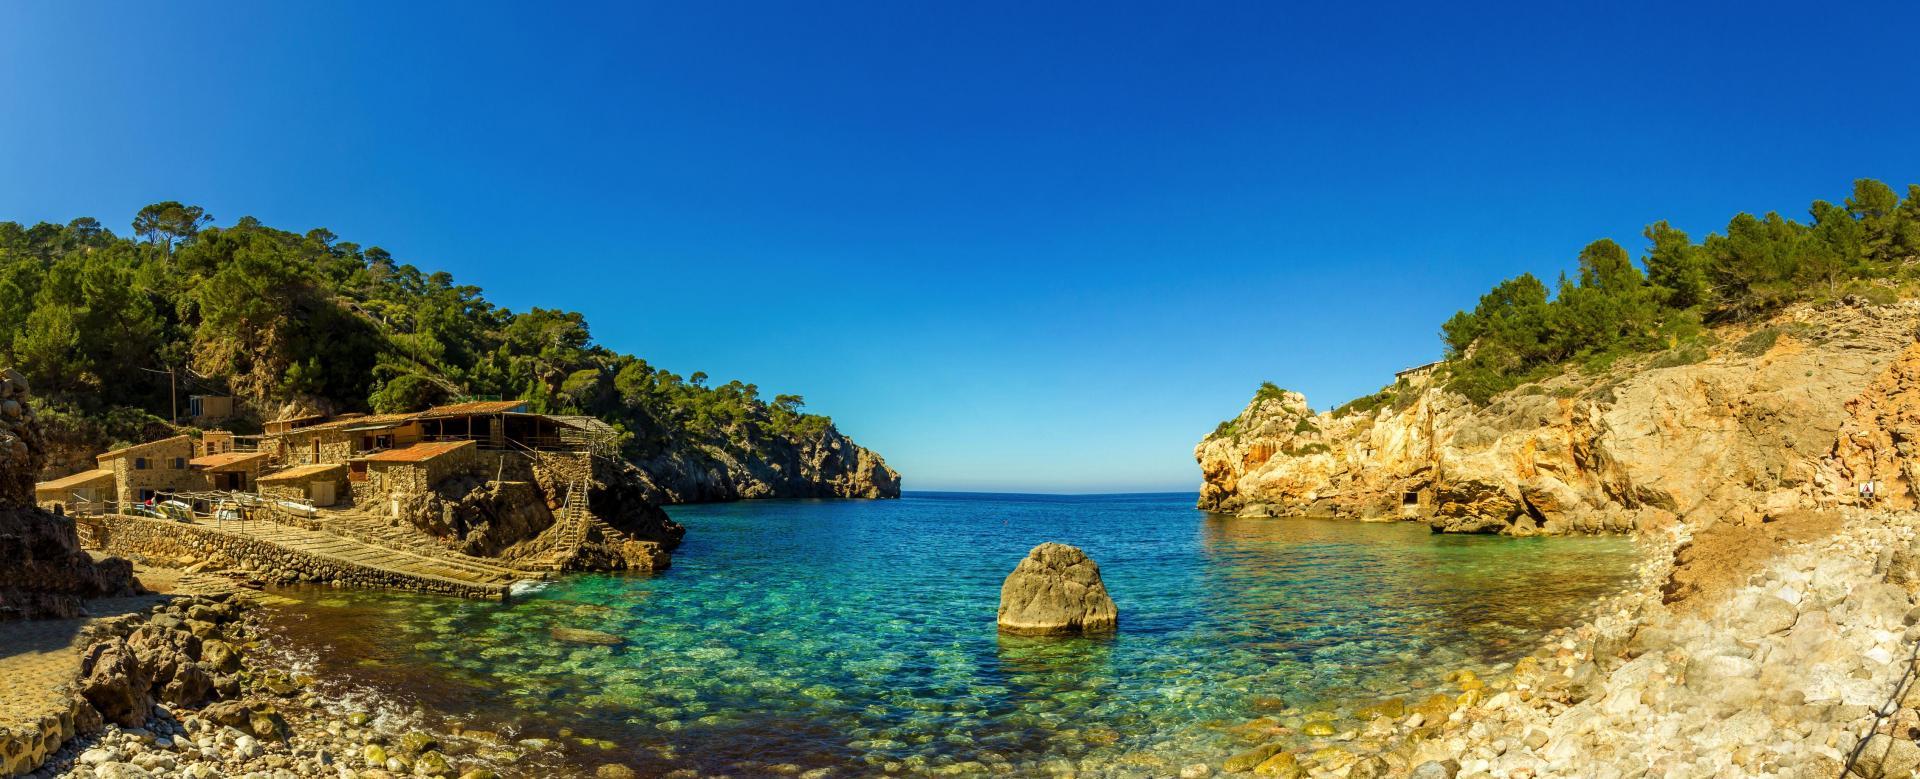 Voyage à pied Espagne : Lumineuse majorque